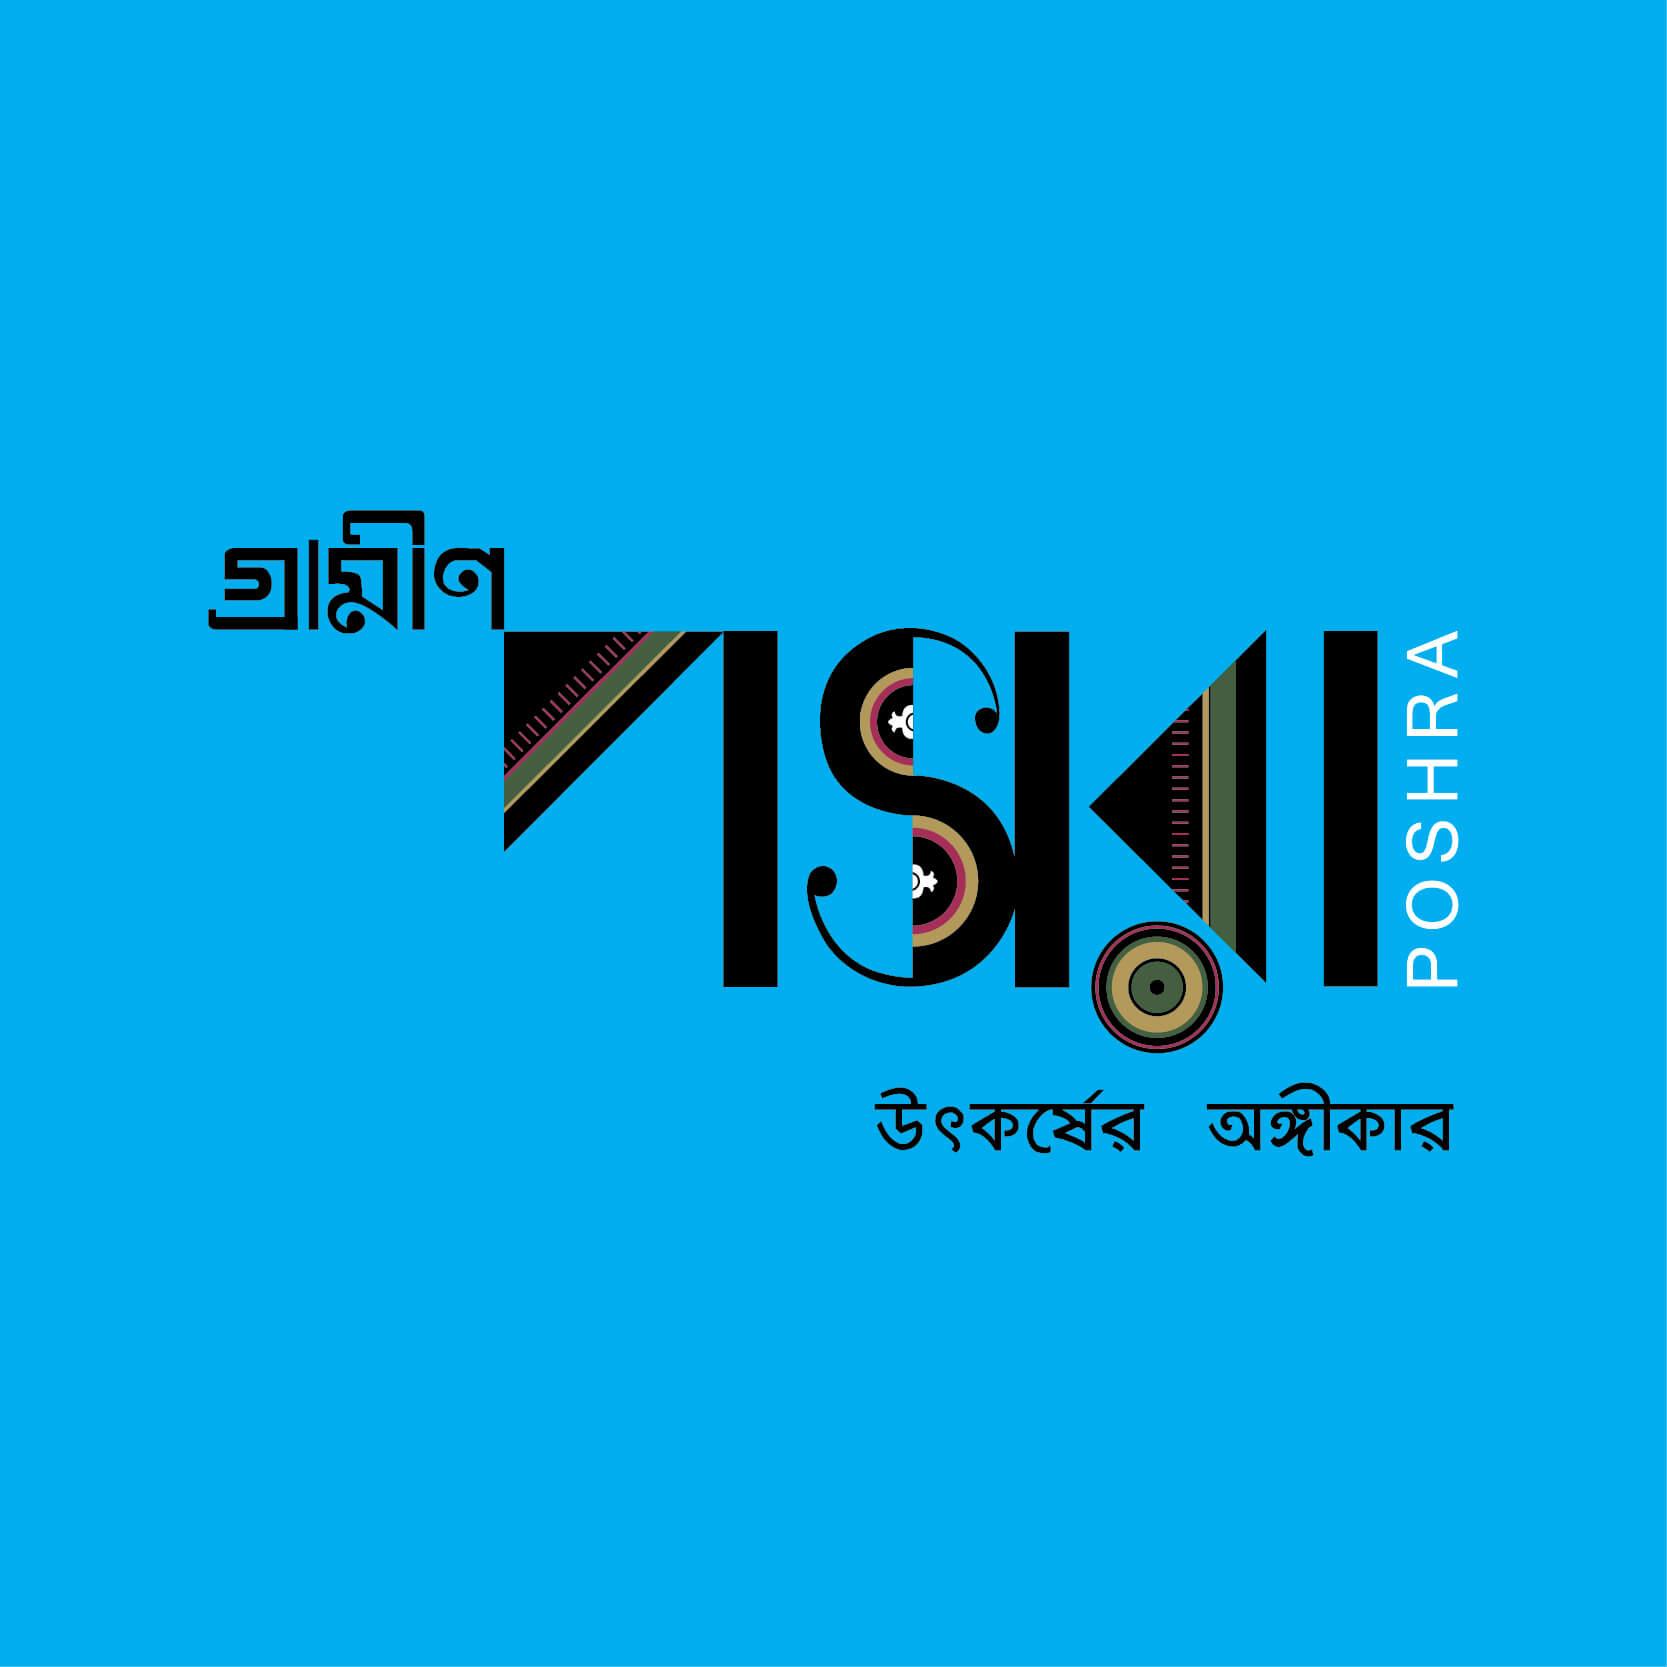 DTC-Clients-Served-Logo-Poshra